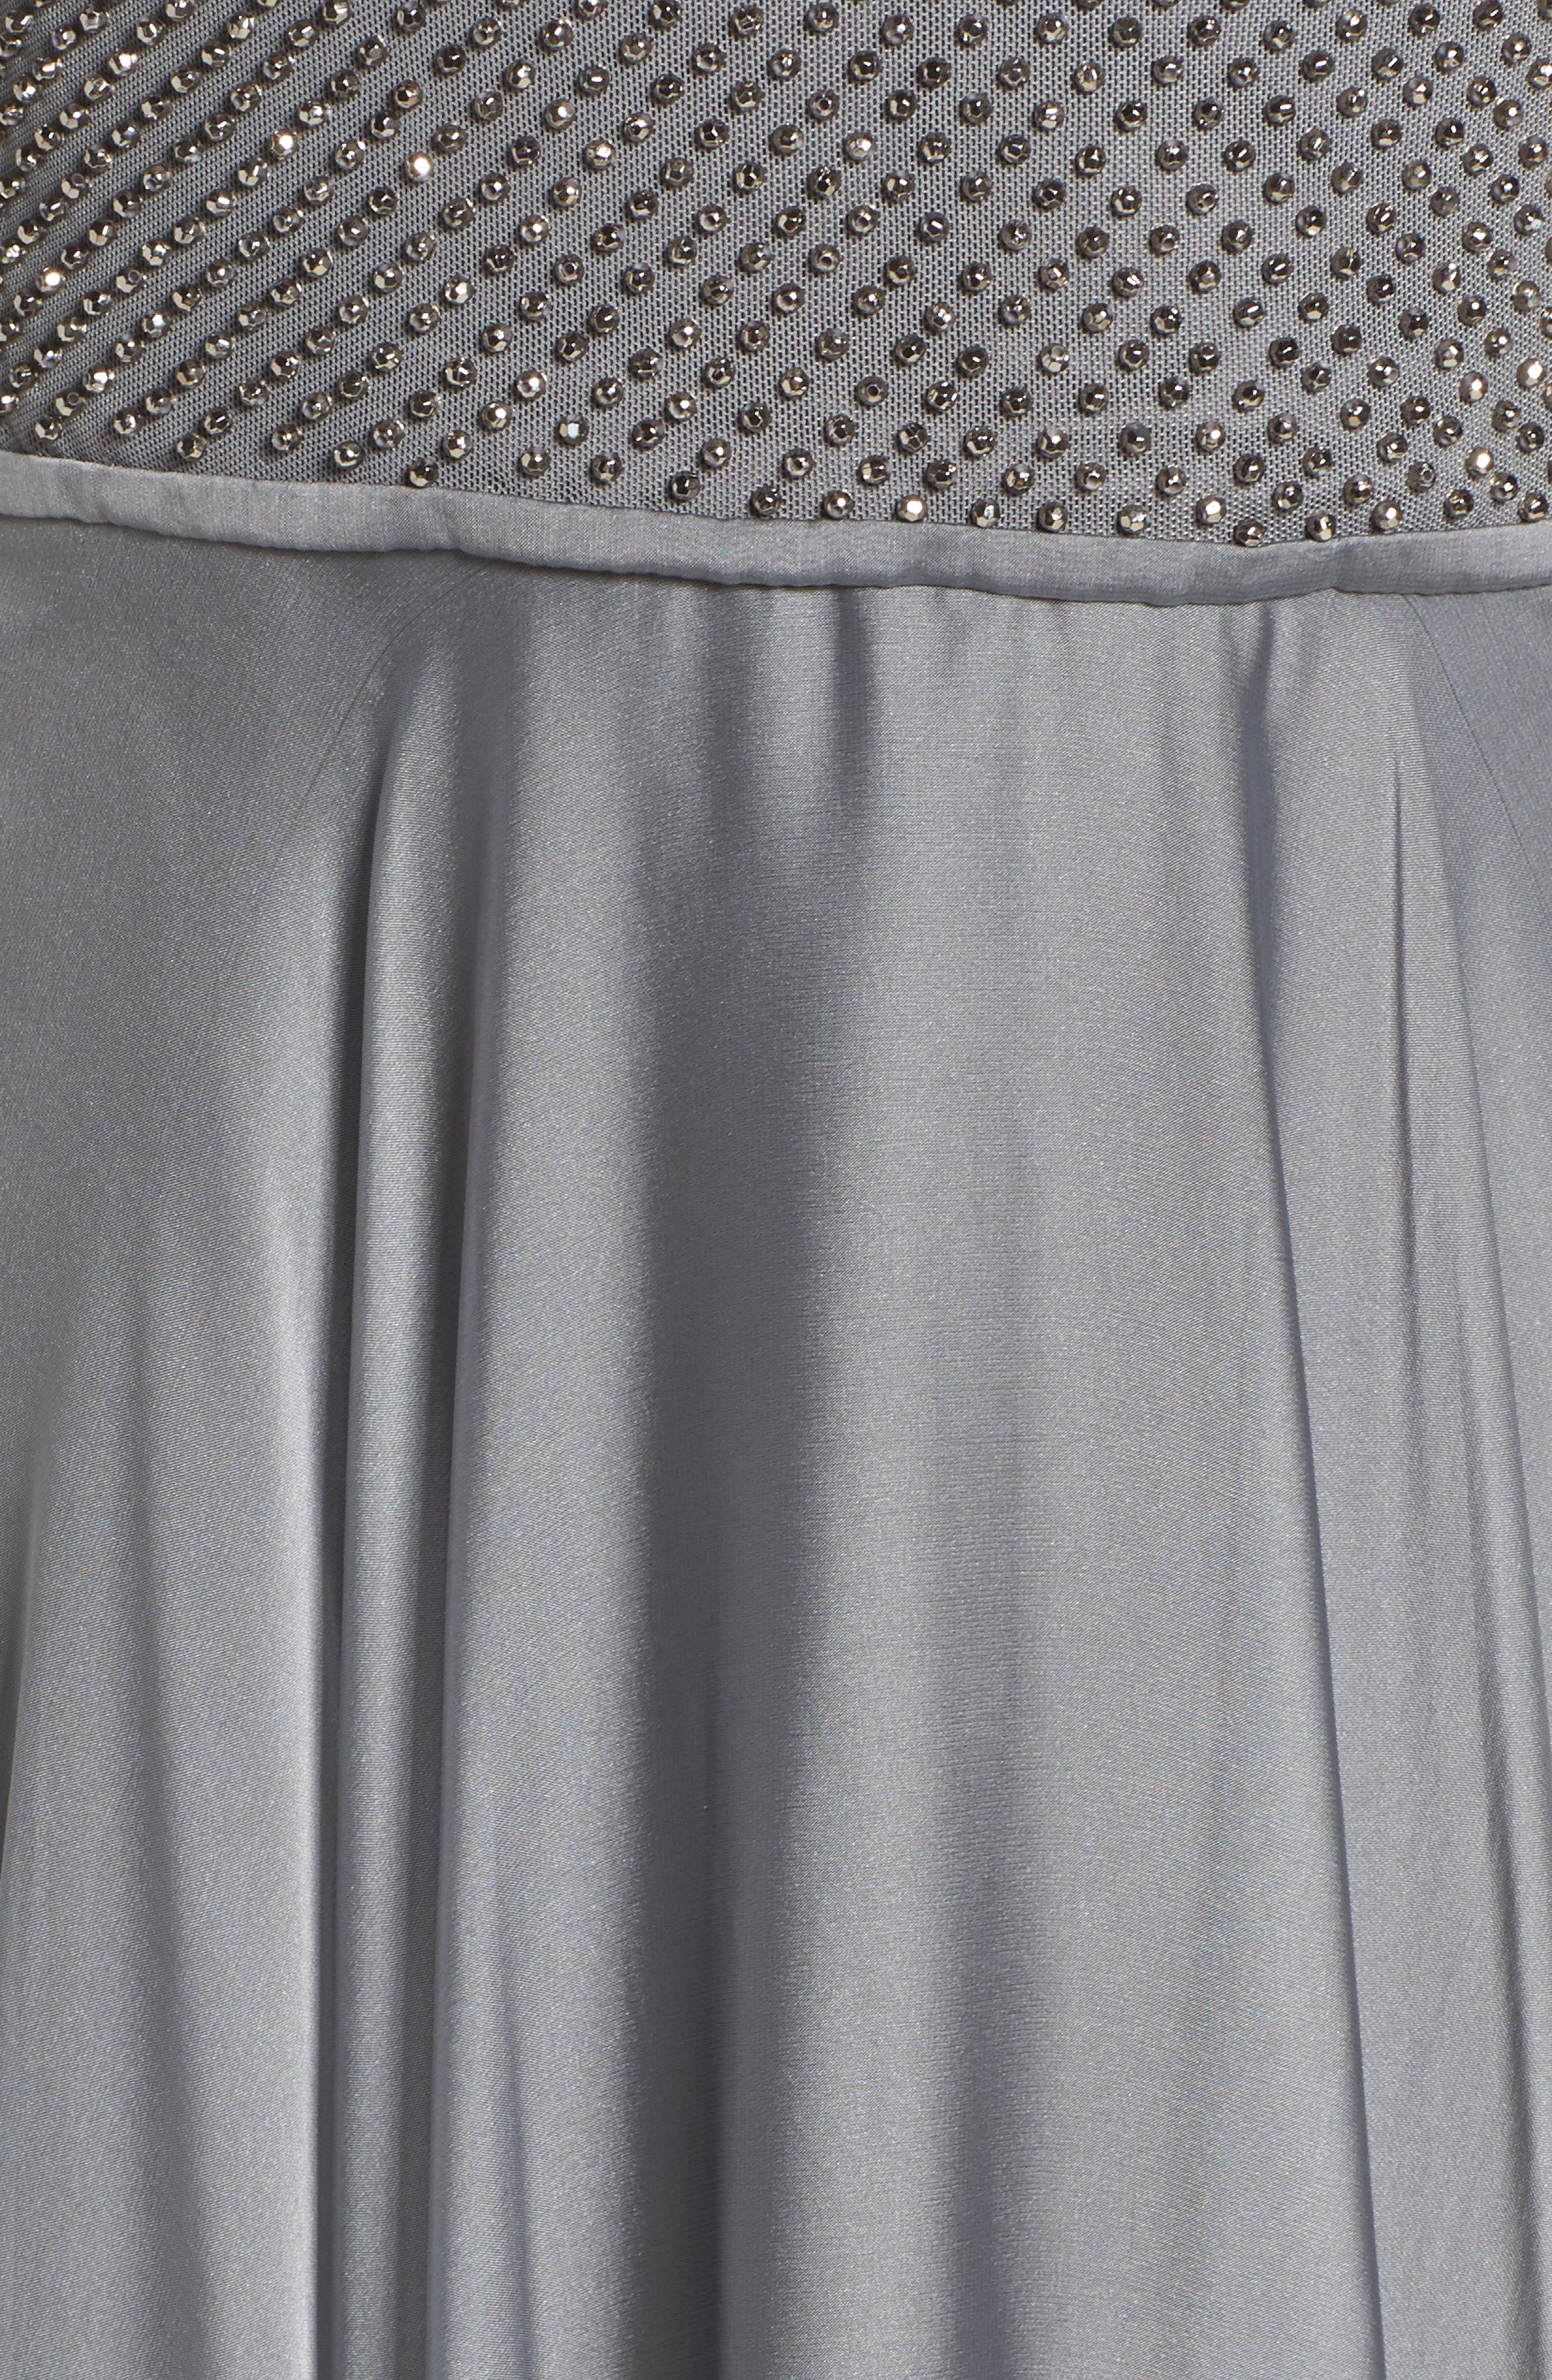 Embellished Bodice Gown,                             Alternate thumbnail 5, color,                             PLATINUM